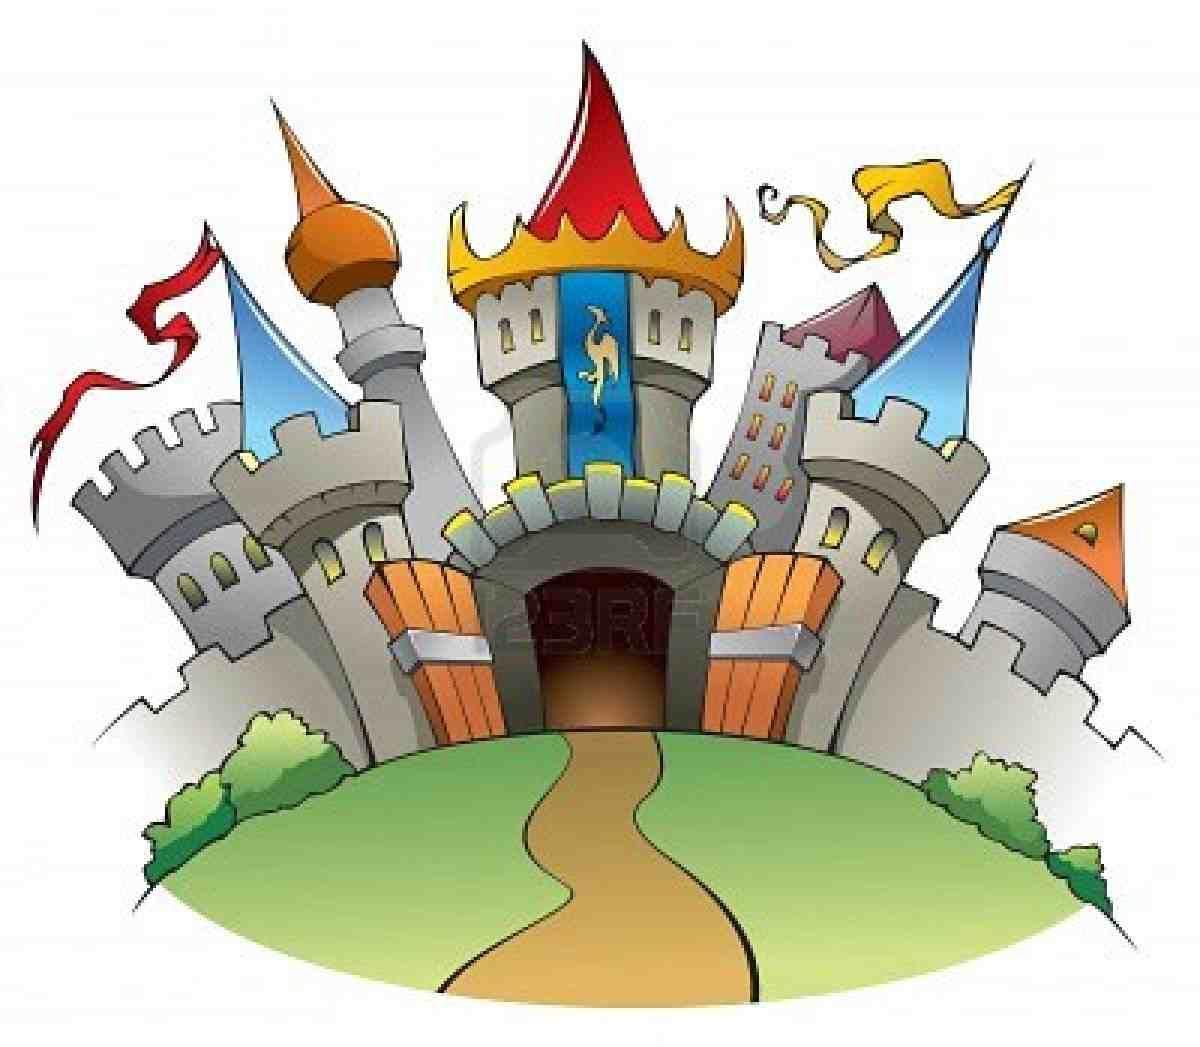 Fairy castle clipart clip art black and white Fairytale Castle Pictures - ClipArt Best | Baby Matthew | Medieval ... clip art black and white